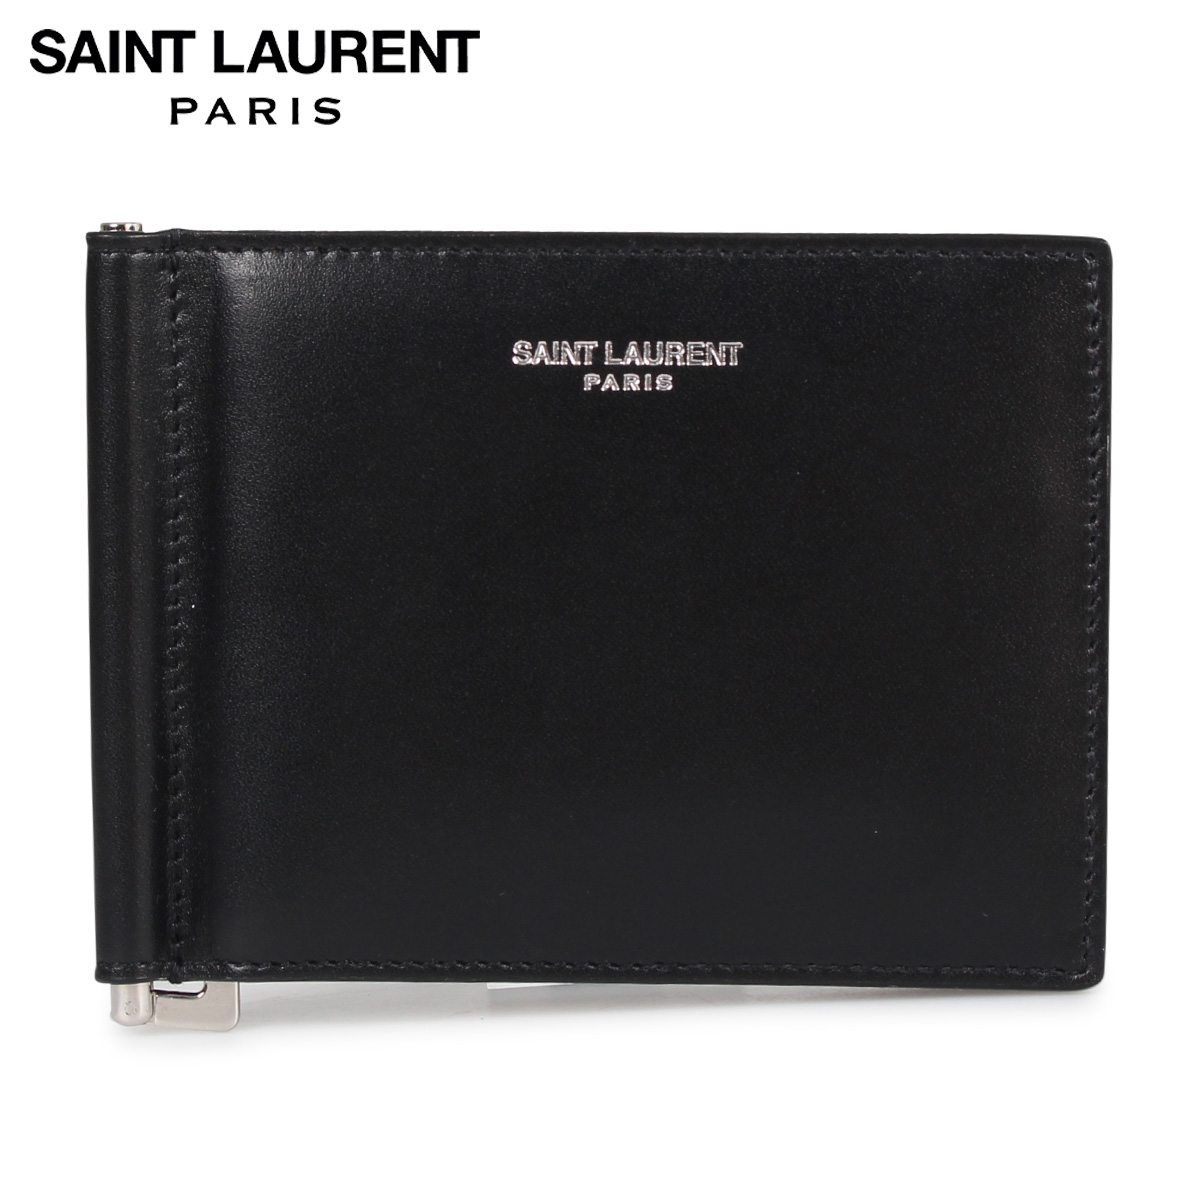 SAINT LAURENT PARIS サンローラン パリ 財布 二つ折り マネークリップ メンズ BILL CLIP WALLET ブラック 黒 3780050U90N